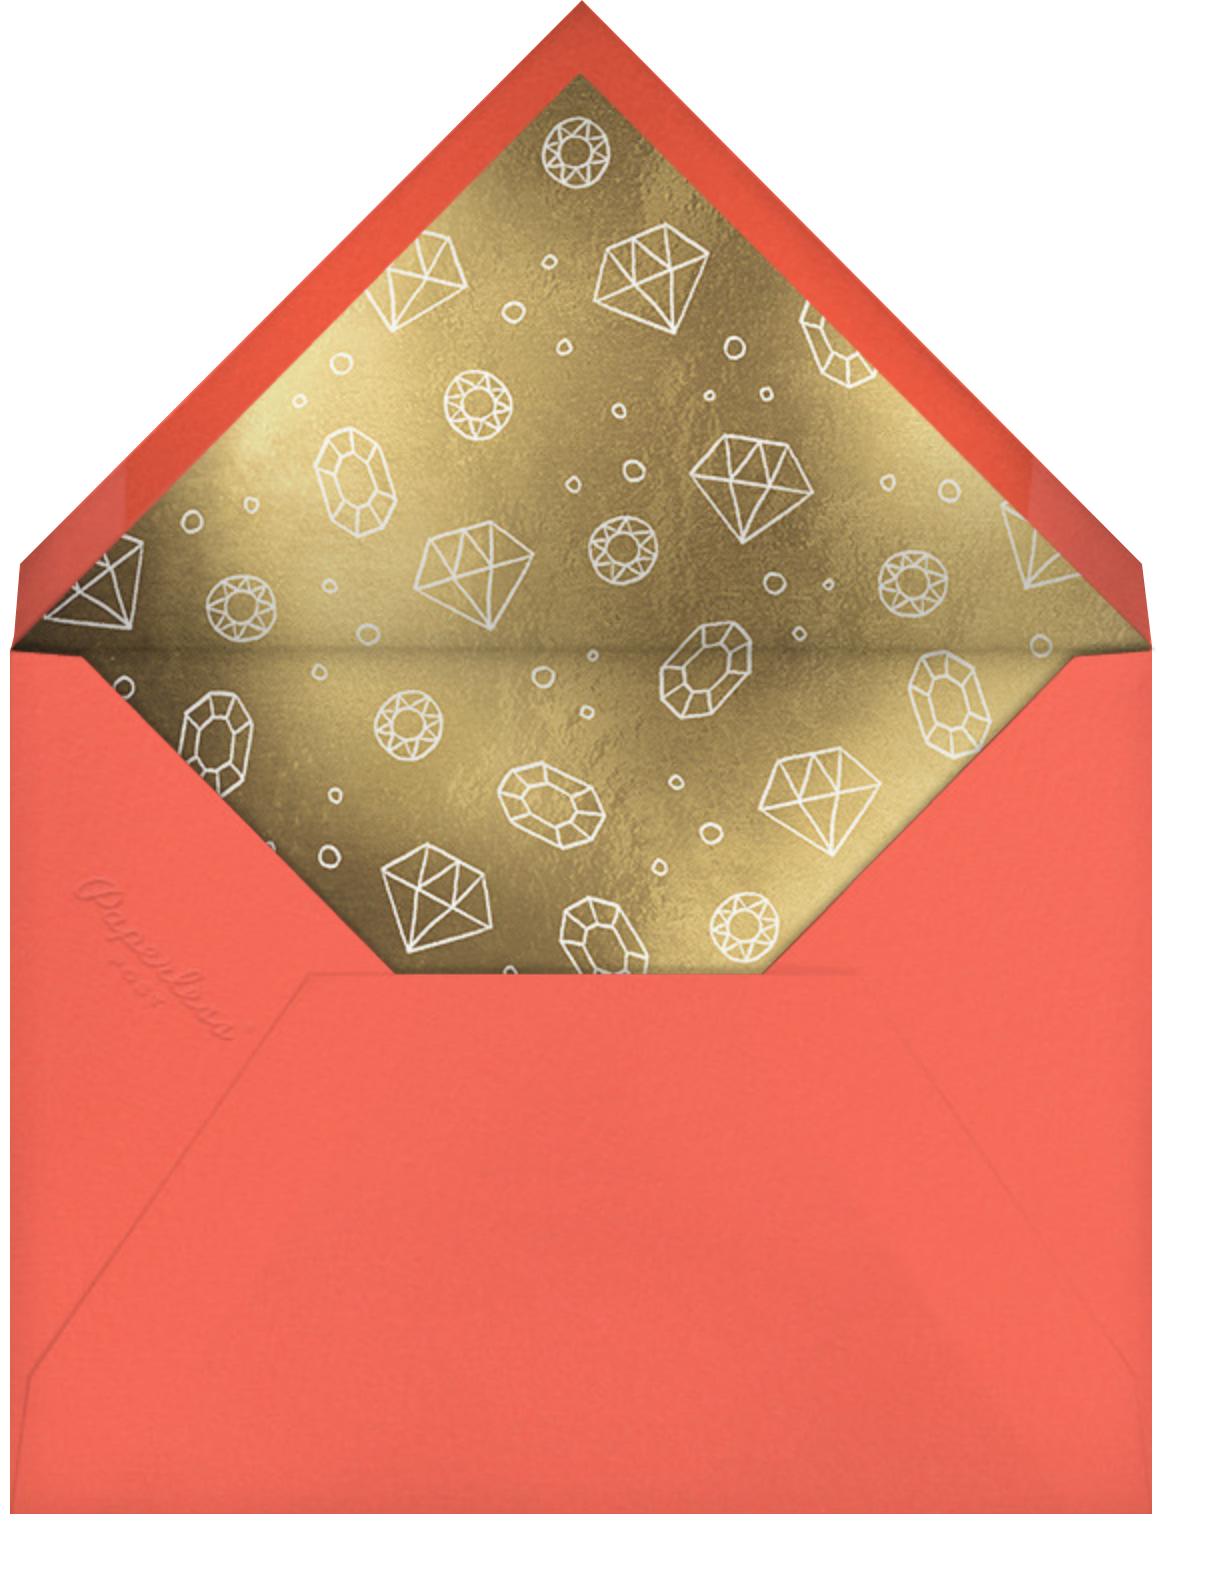 Pirate Treasure - Paperless Post - Mermaid birthday invitations - envelope back